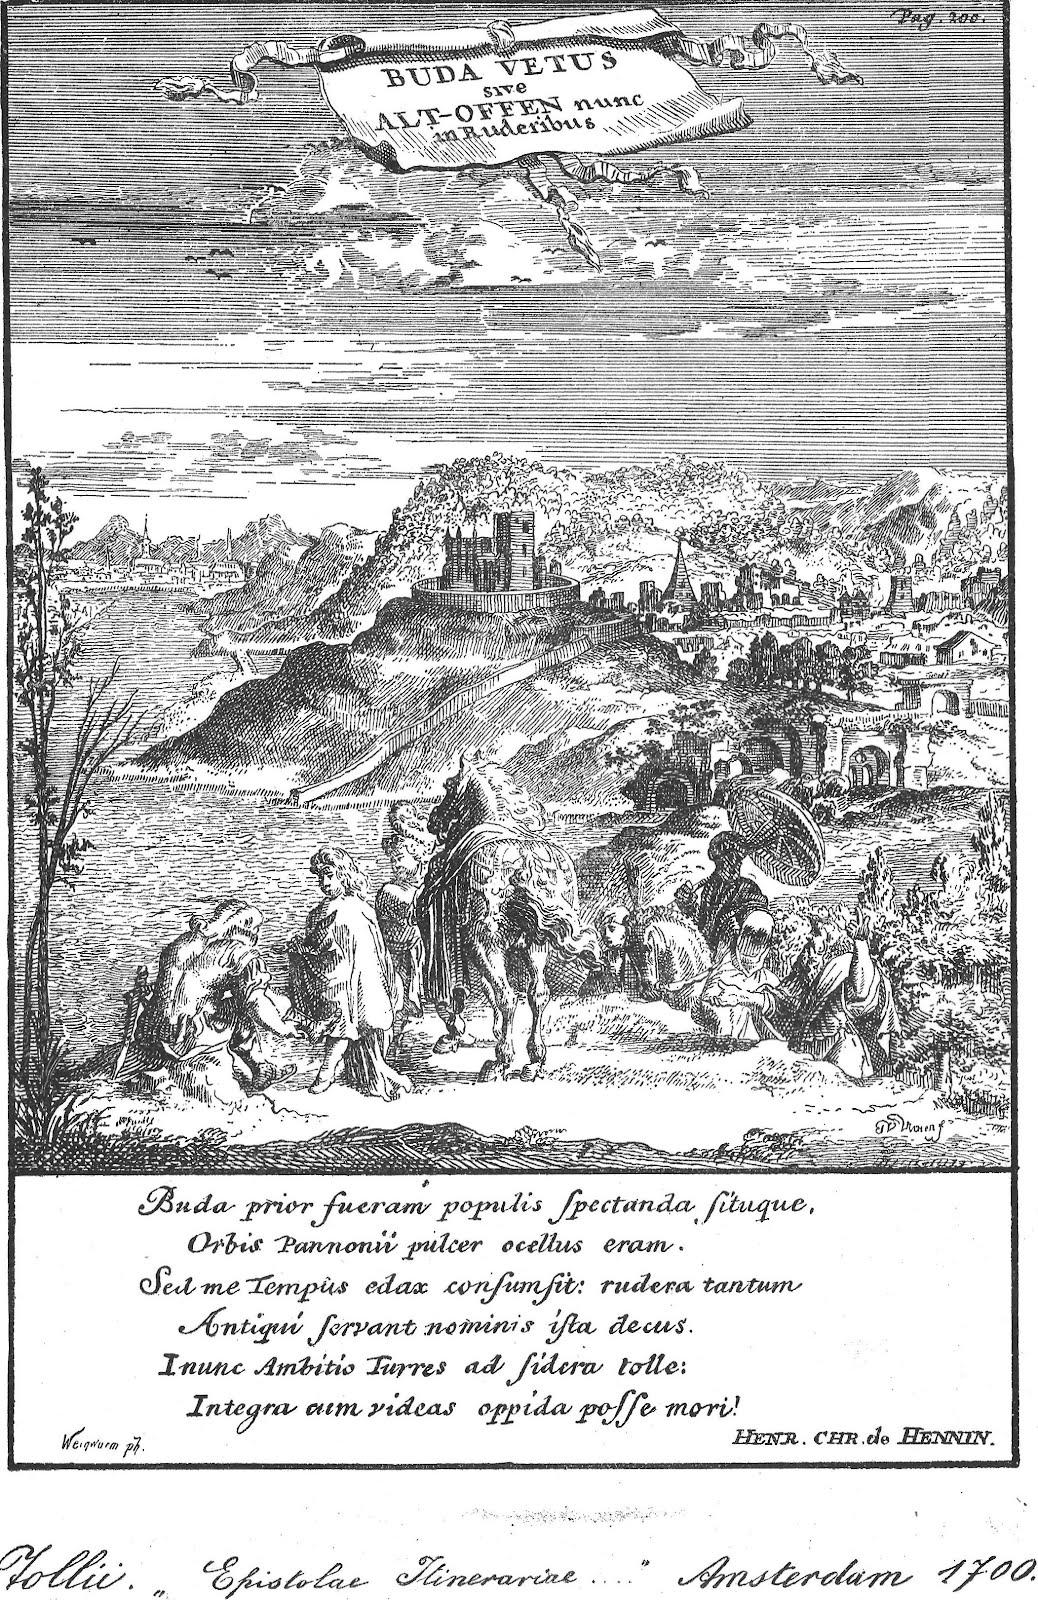 Az Ős-Buda Ó-Buda blog,Sicambria-Acinco-Atilla városa-ÖsBuda-Fehérvár-Buda Vetus-Alt Offen-Ó-Buda